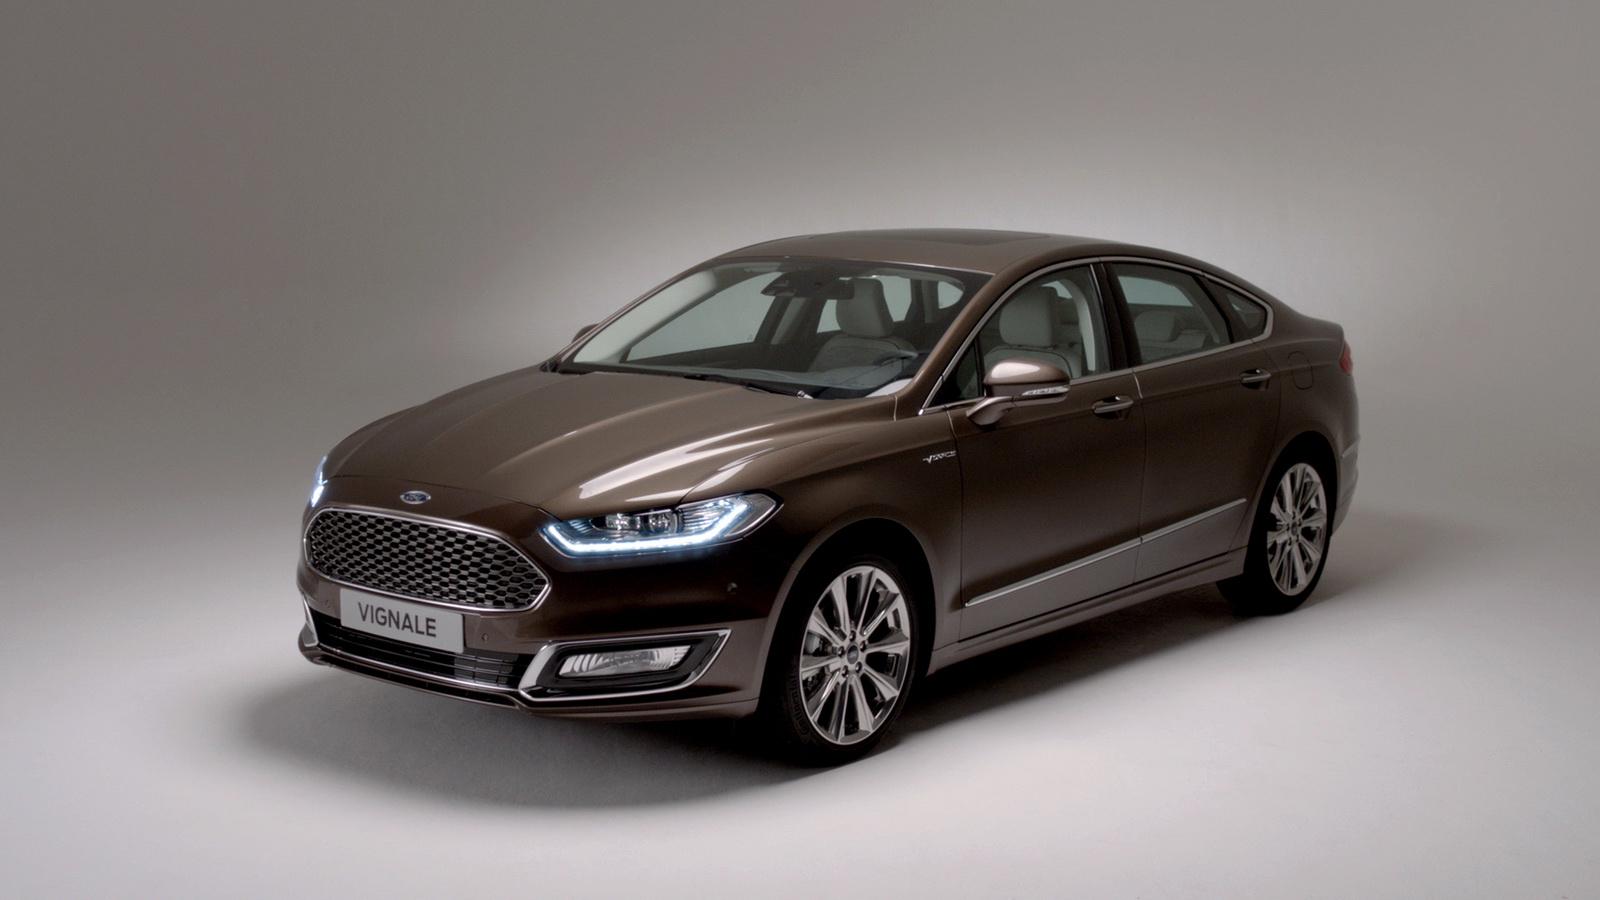 2022 Ford Mondeo Vignale Configurations